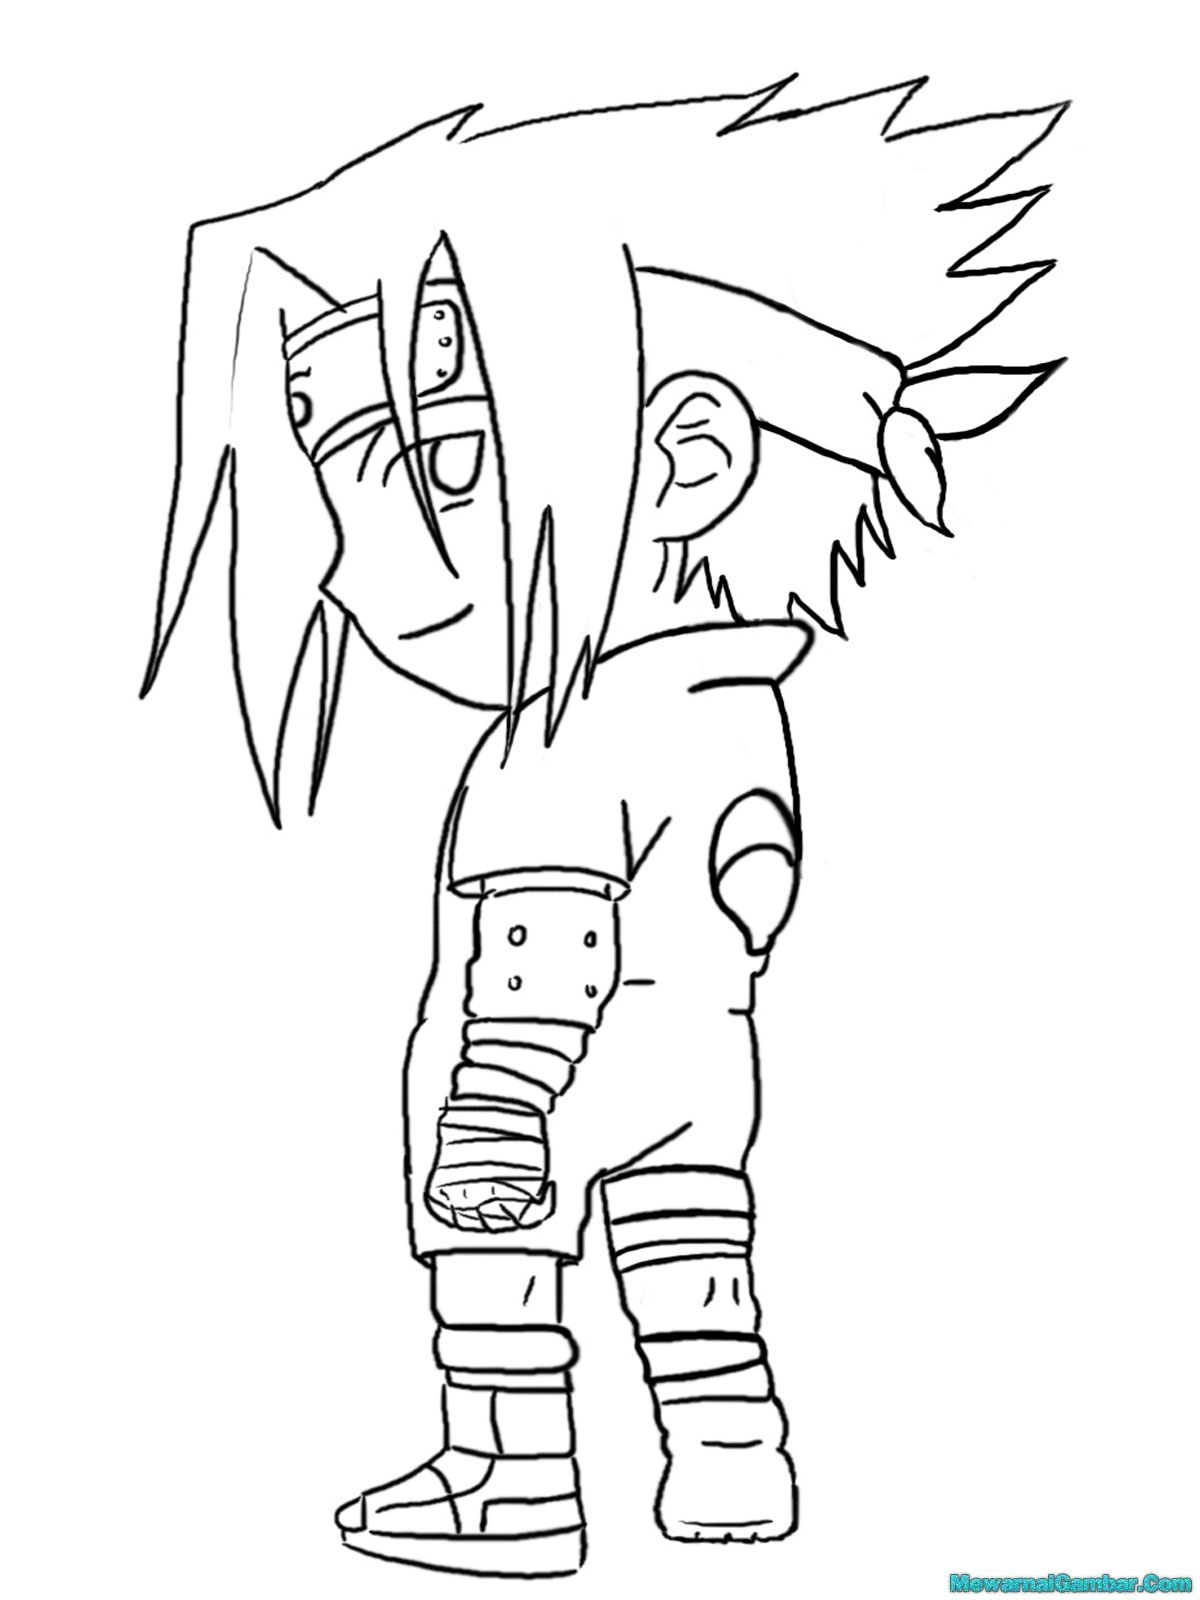 Gambar Mewarnai Naruto Dan Sasuke